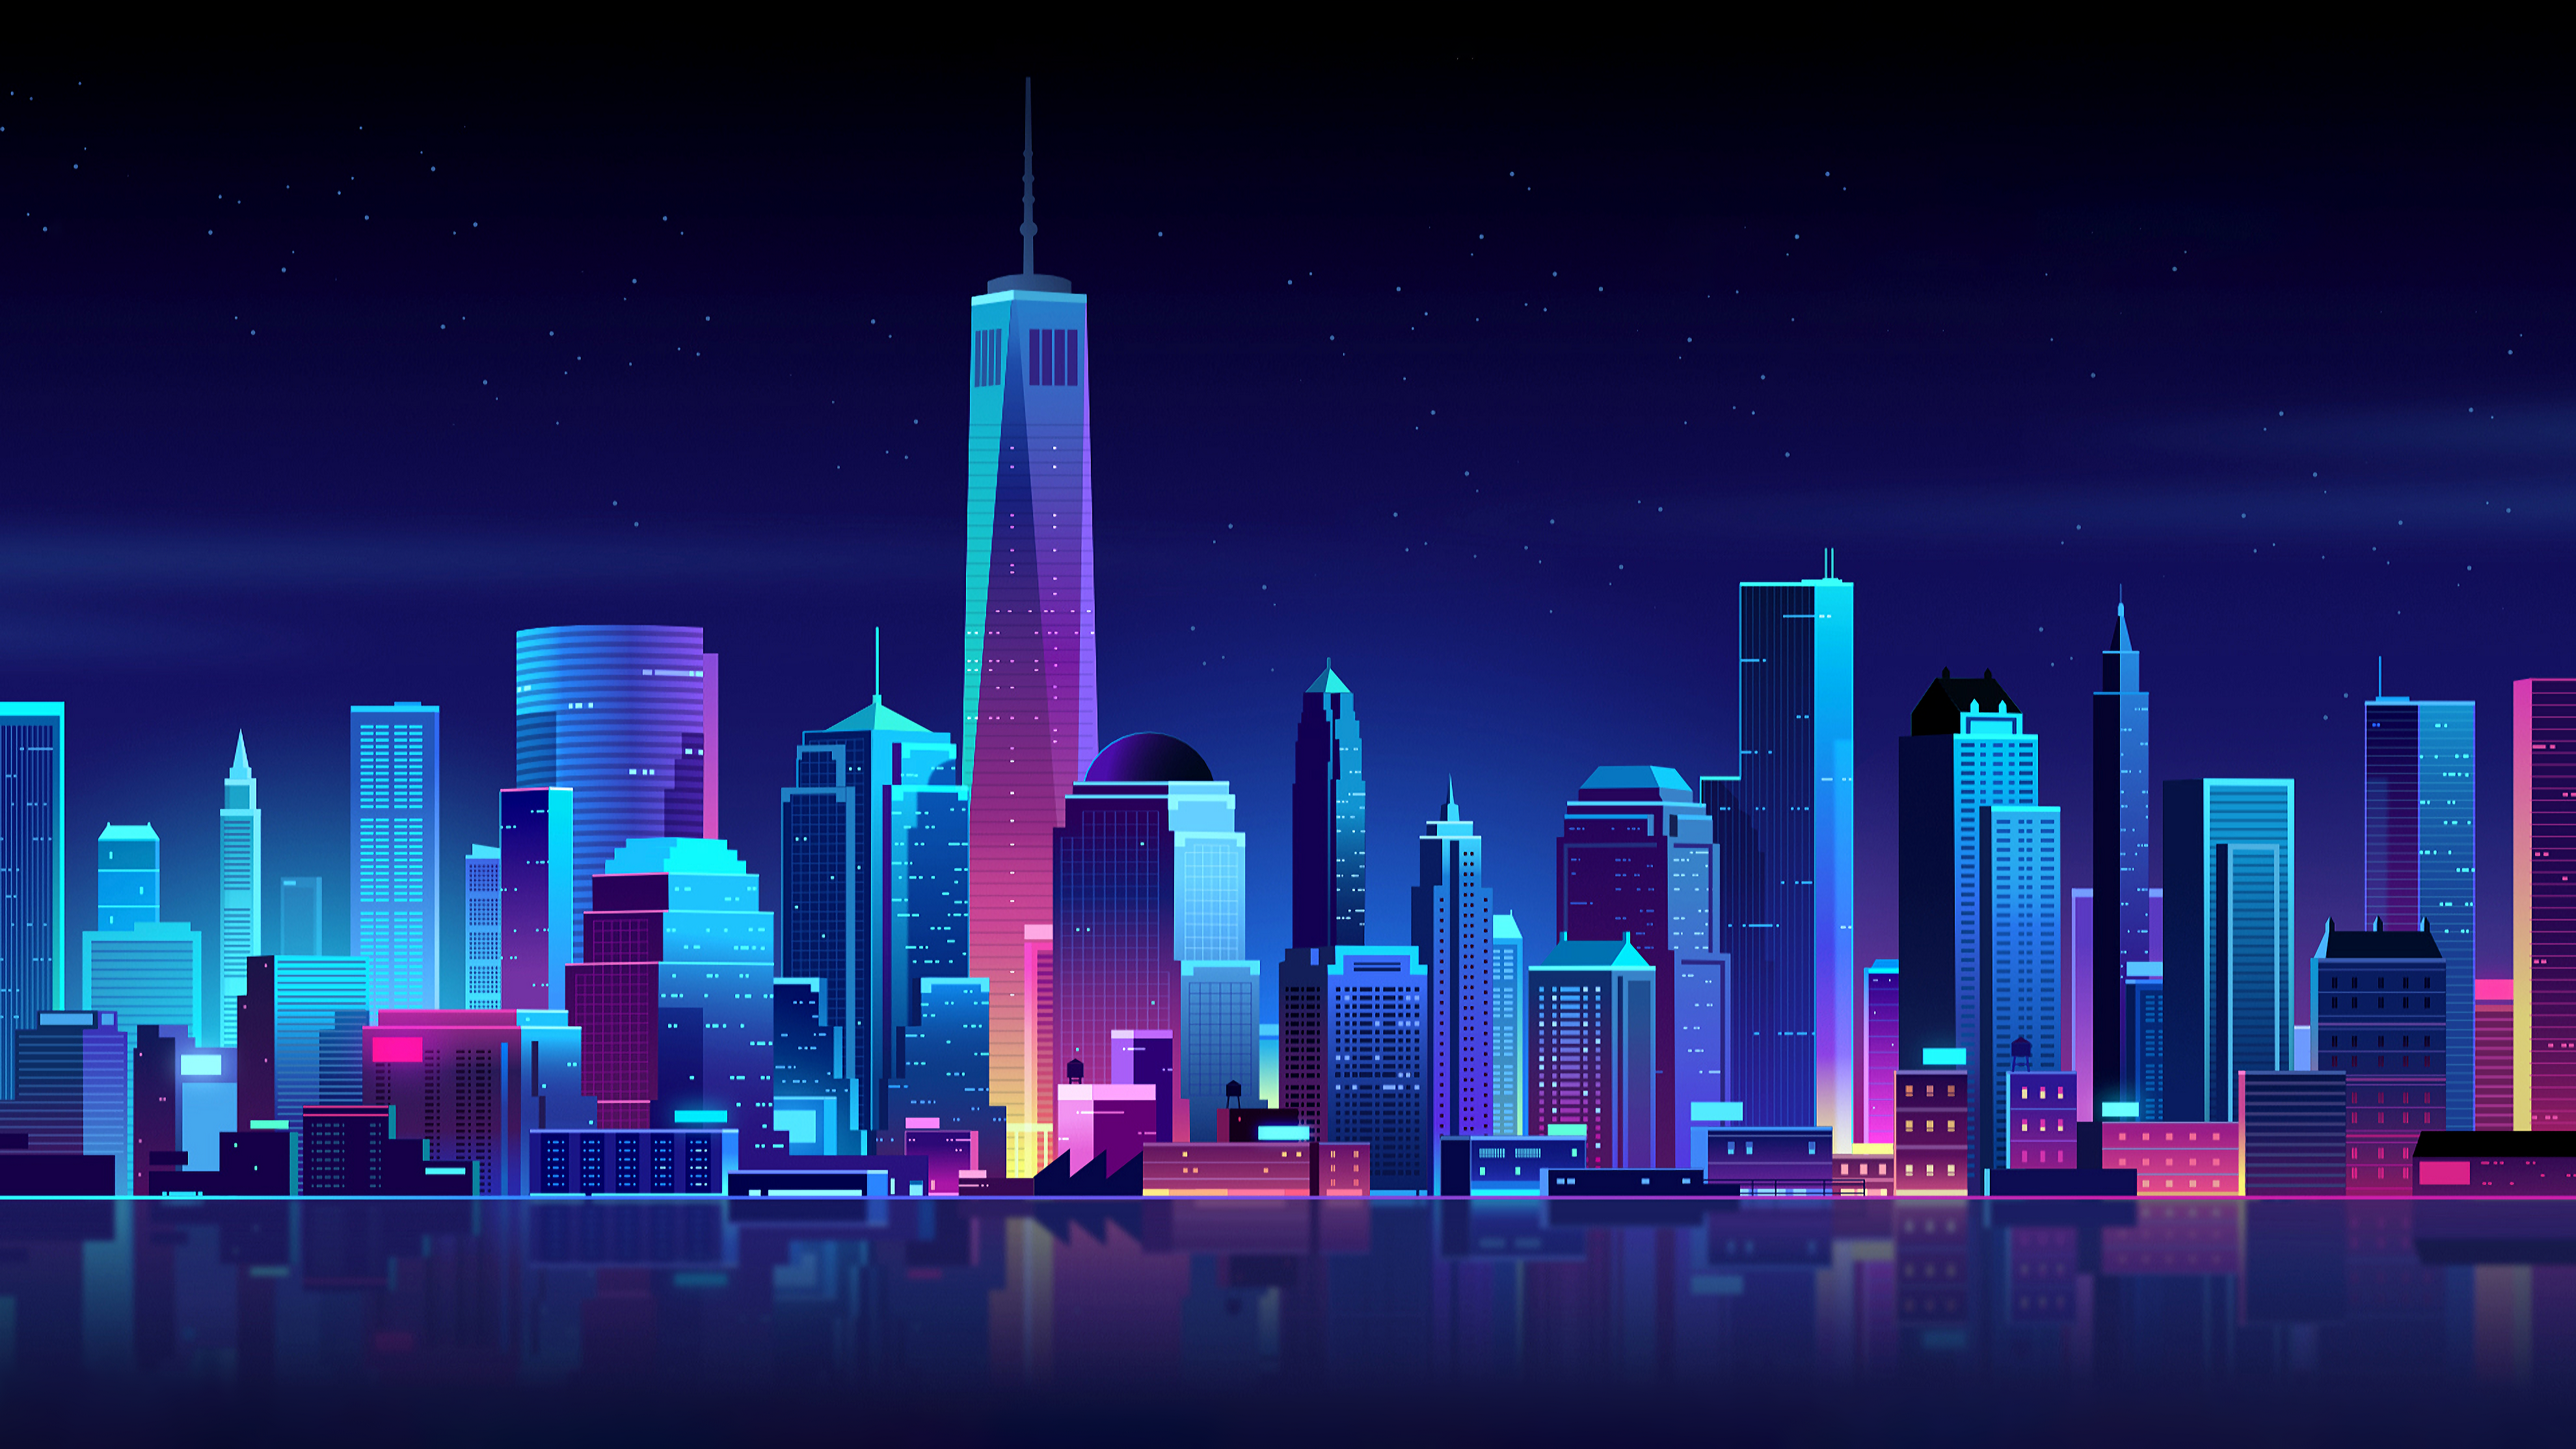 Serverless NYC (Romain Trystram) resized by Ze Robot